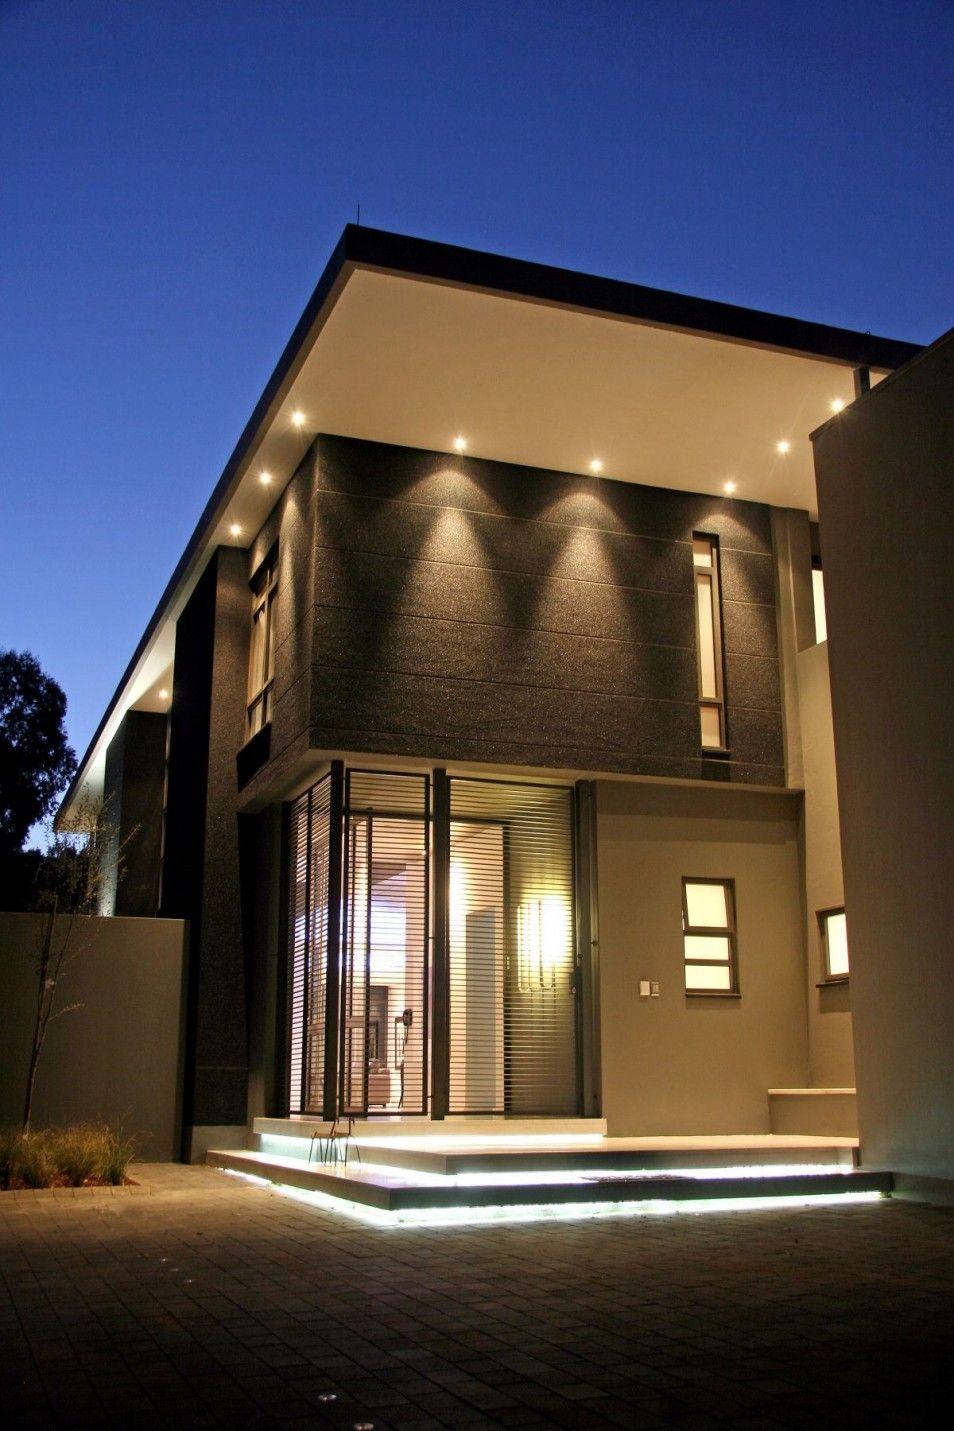 Best Ideas Architecture With Modern Exterior House Designs In - Best architecture home design